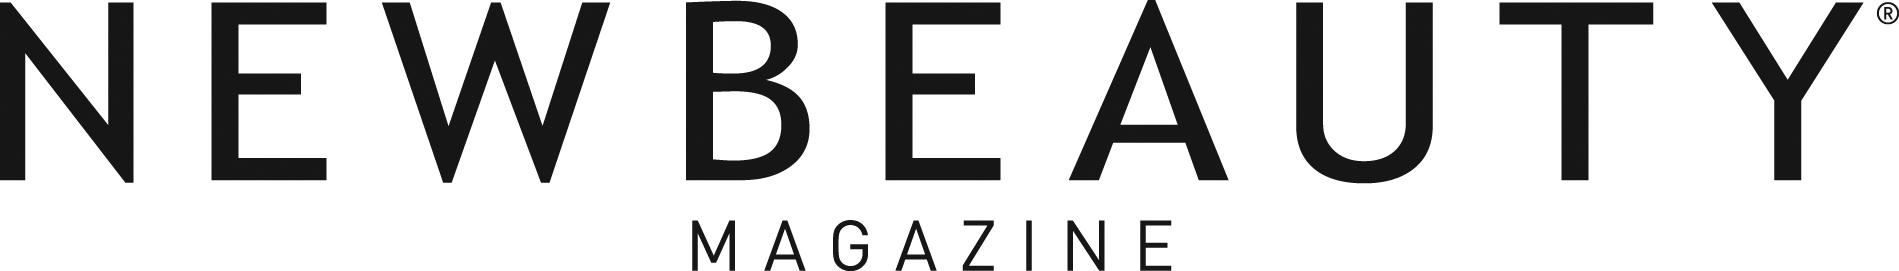 NewBeauty_Logo_Black_Magazine_HiRes.jpg